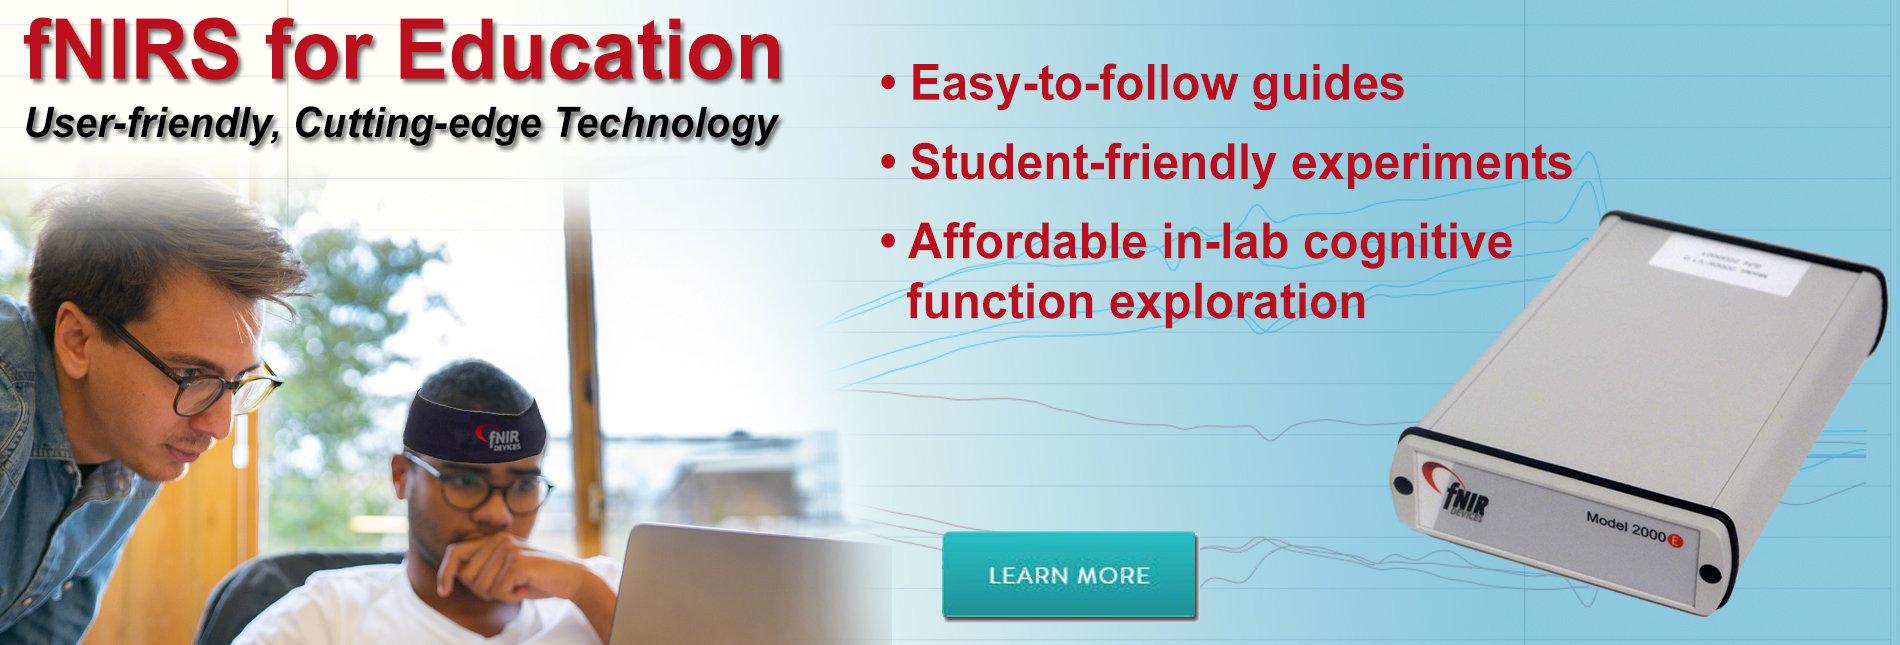 fNIRS Education System